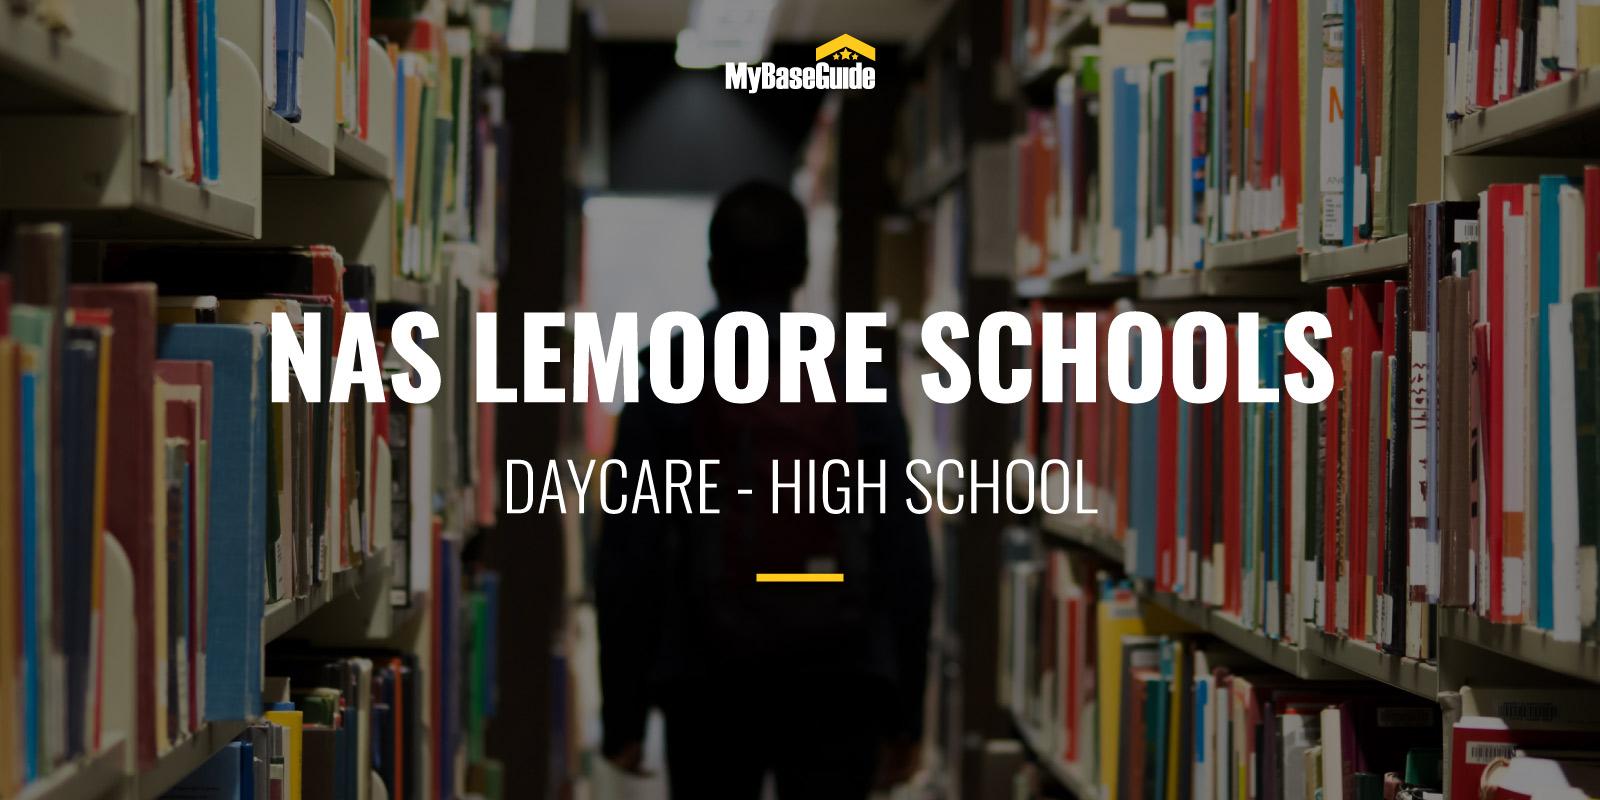 NAS Lemoore Schools: Daycare - High School